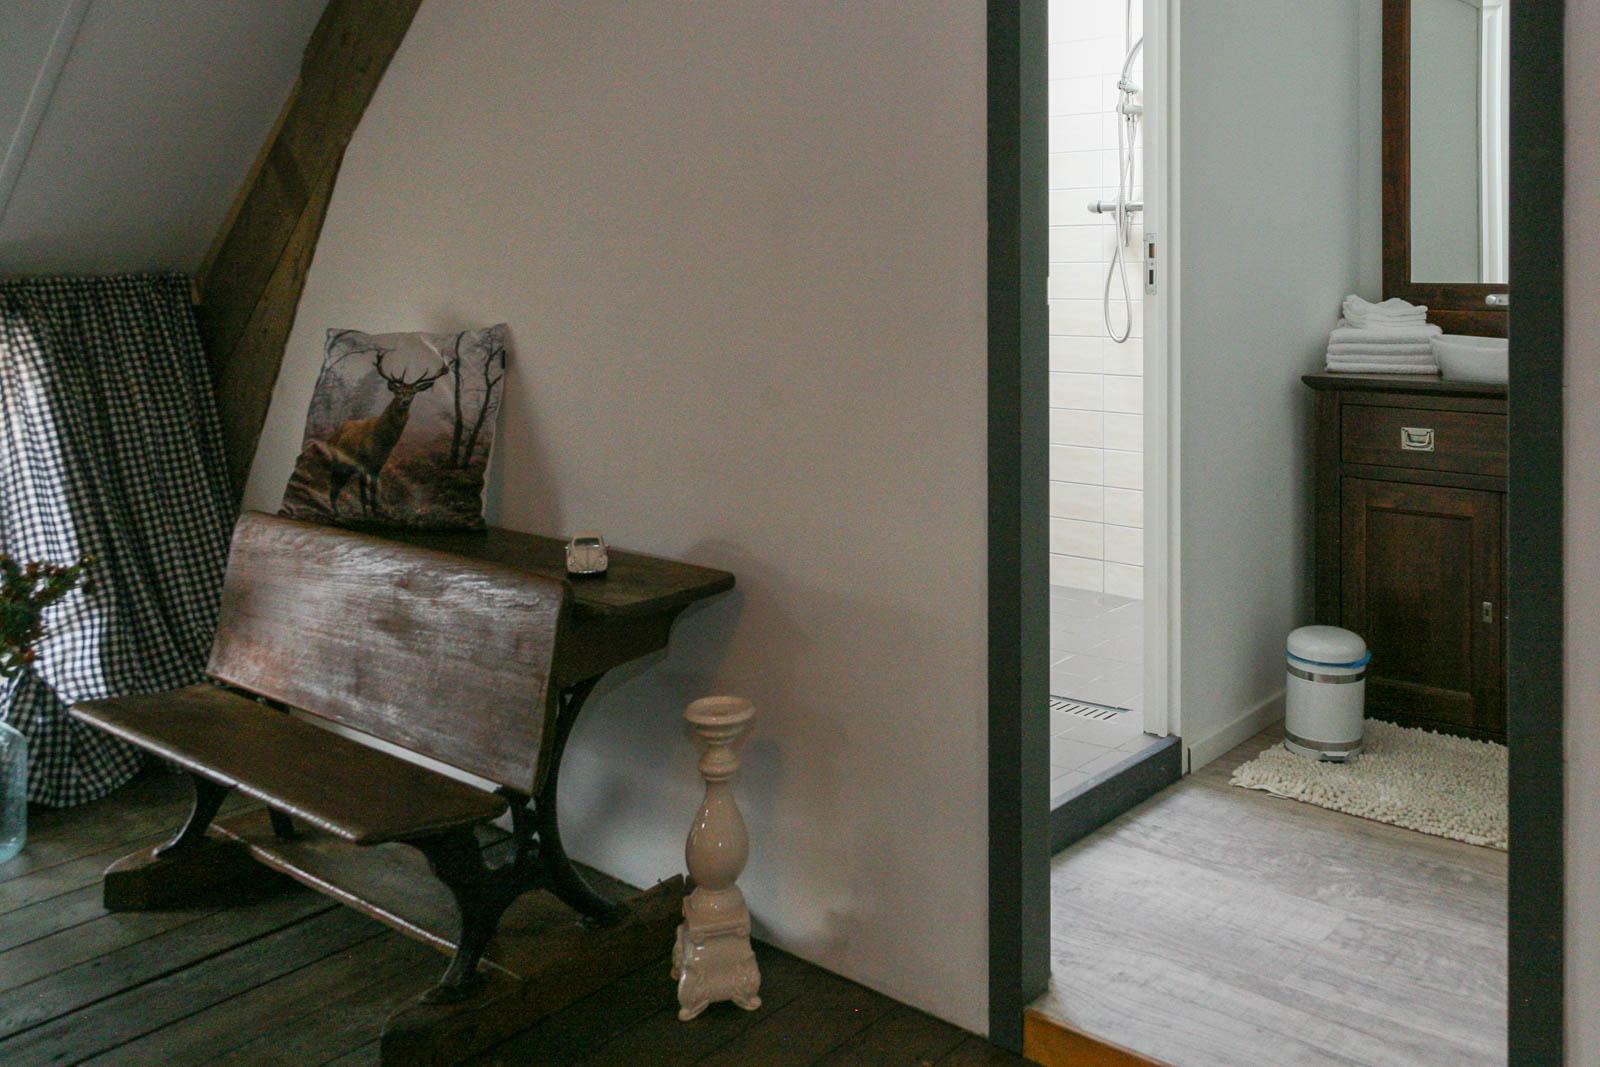 Hillegondahoeve-De Oude Stal-1453